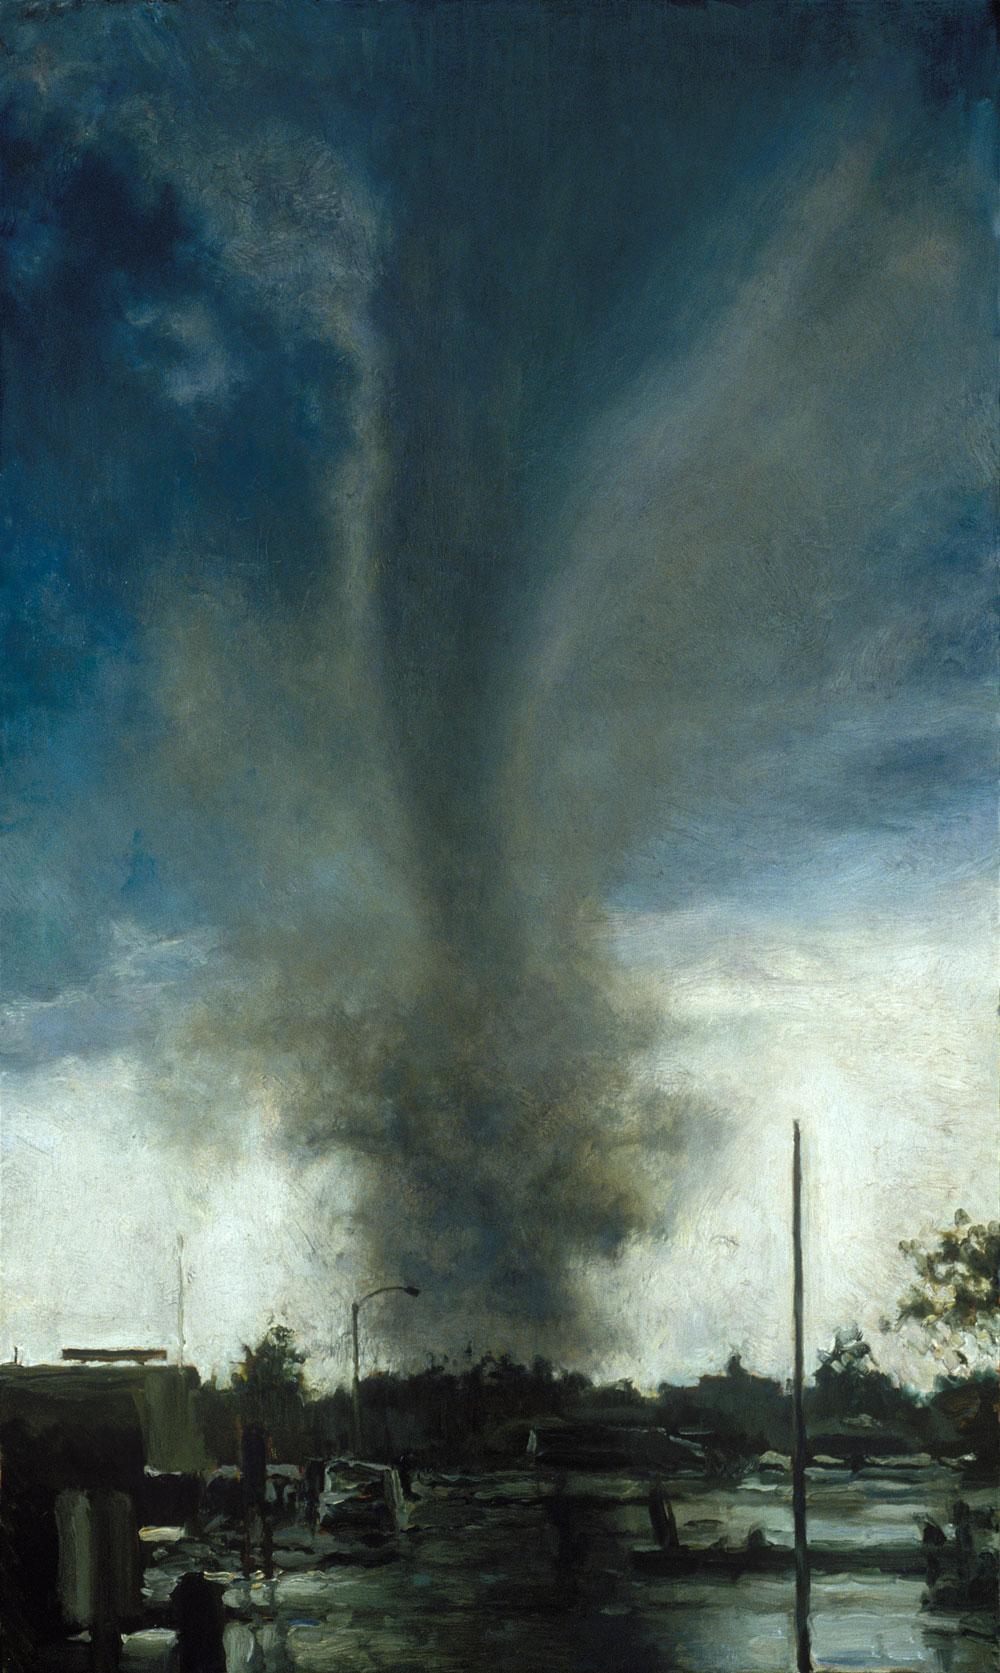 Evening Dancer, 60 x 36, oil on canvas, 2003